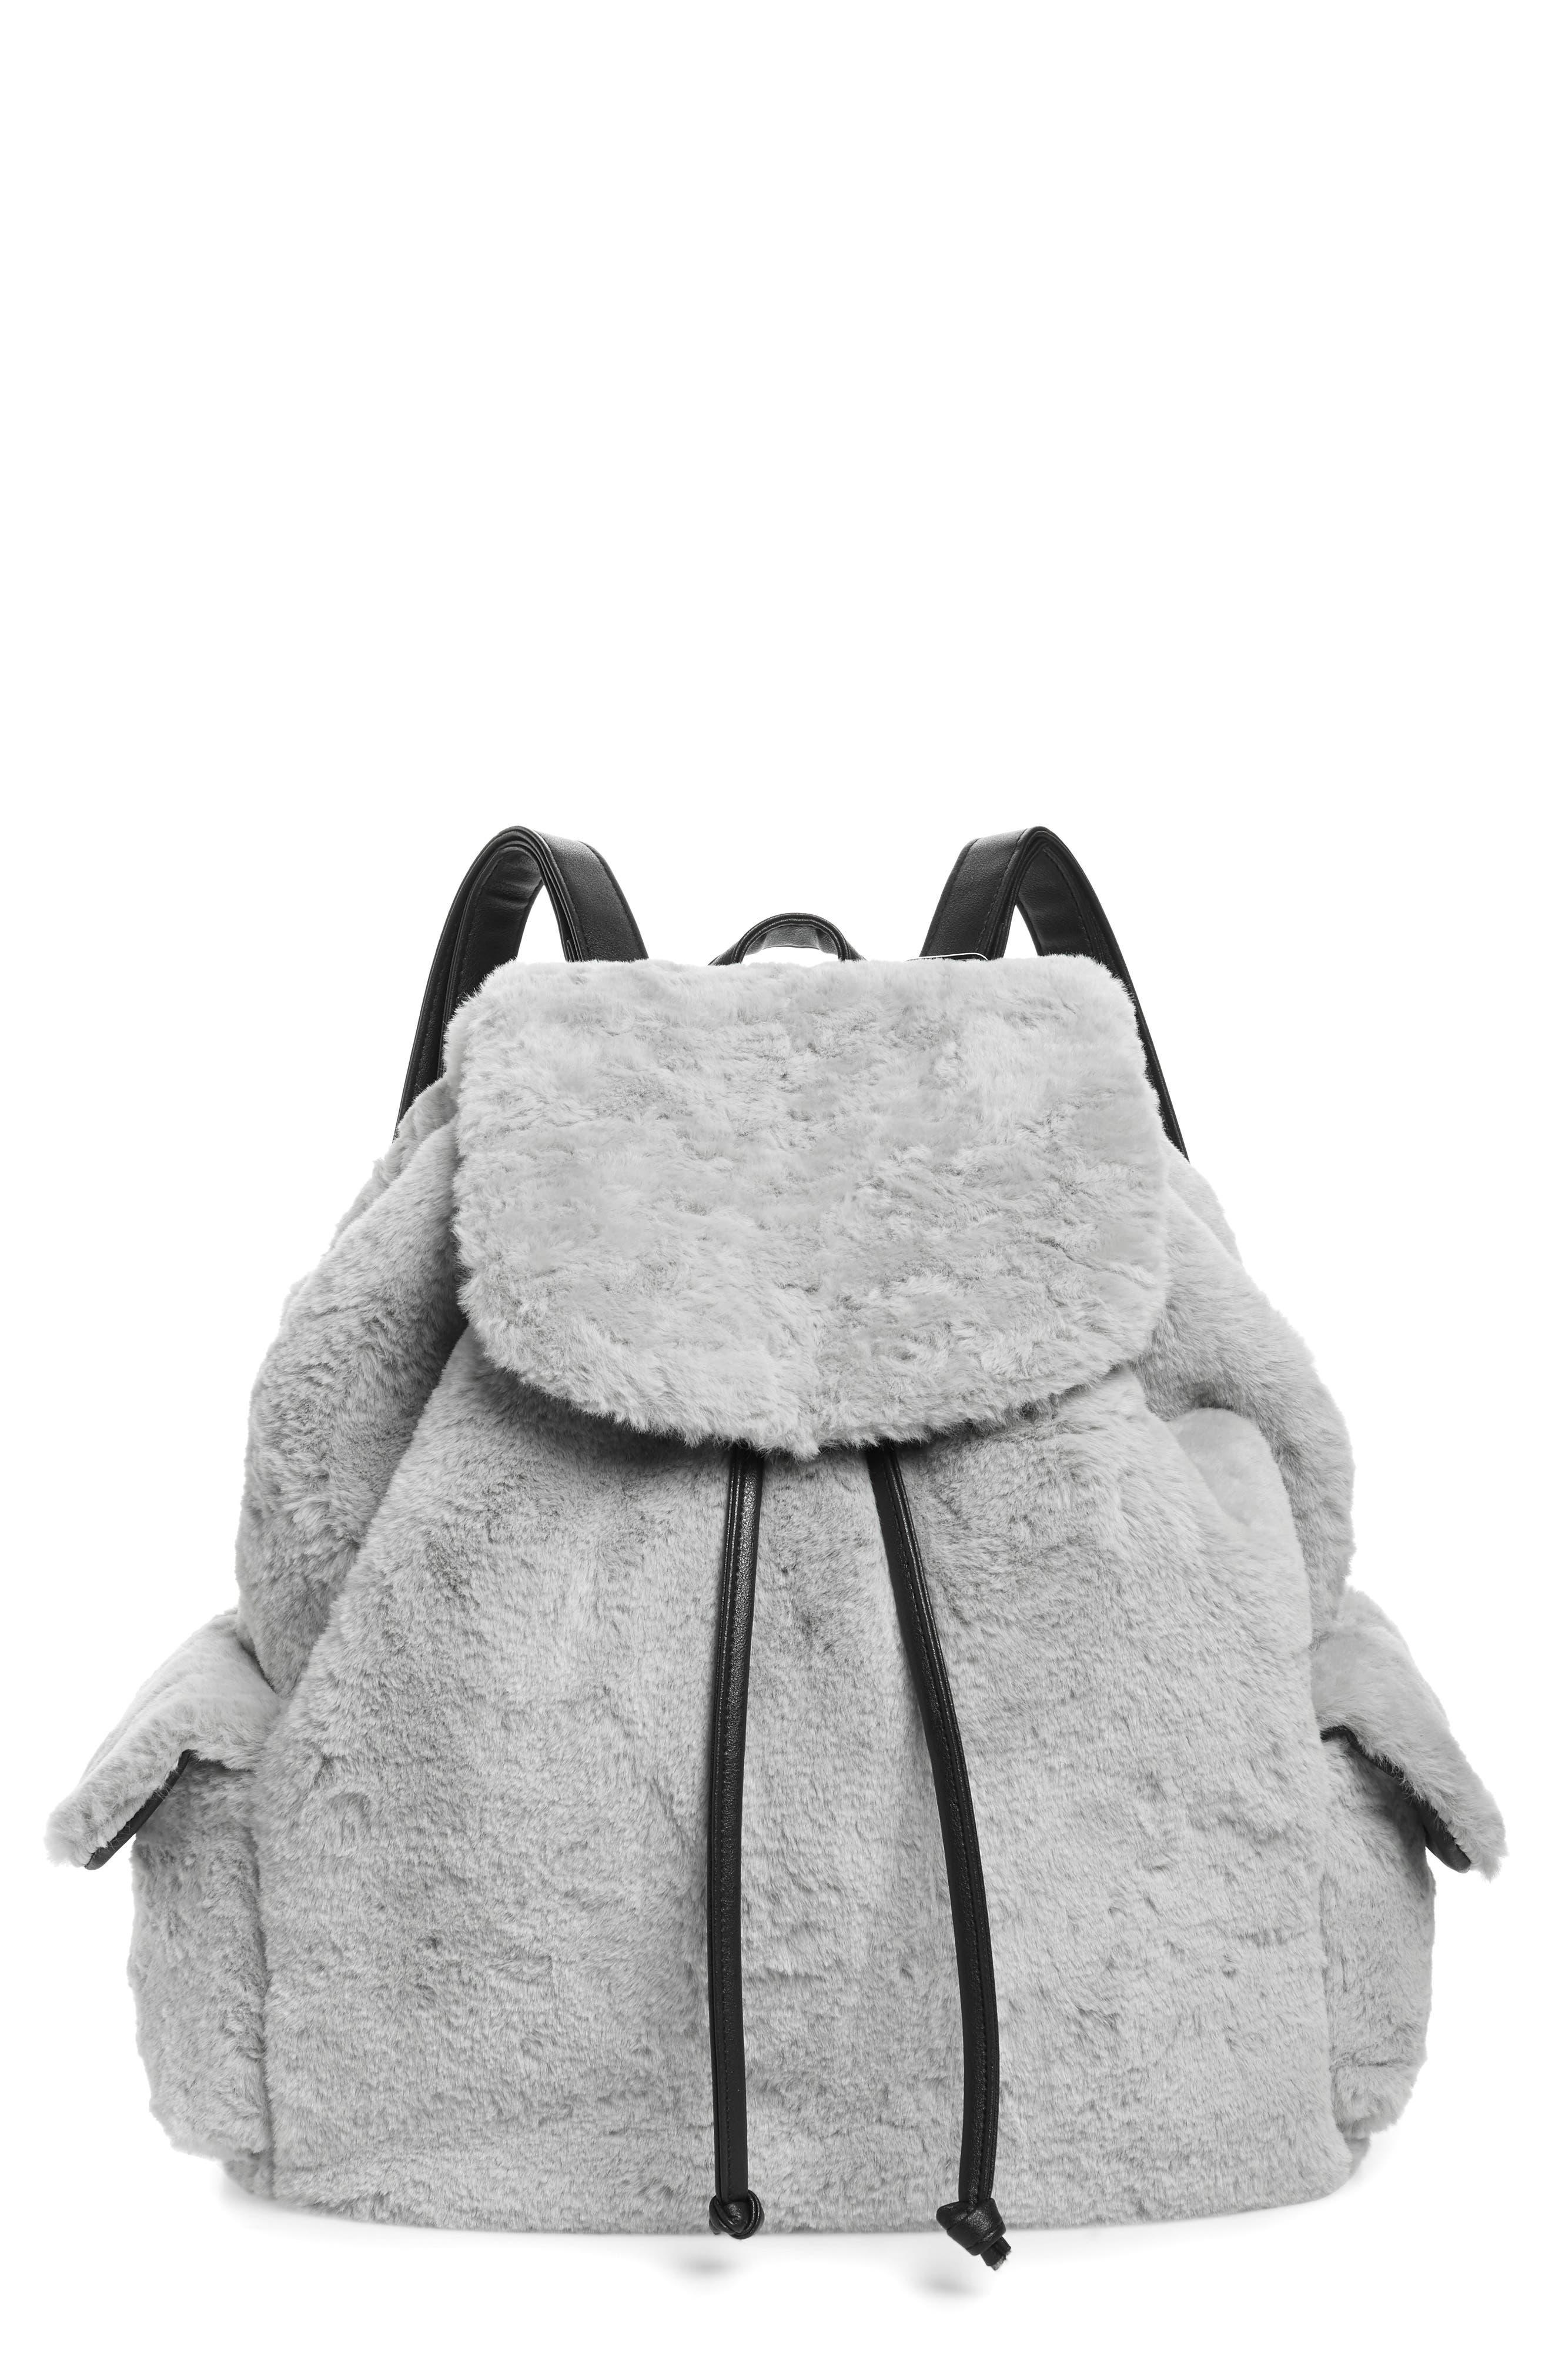 Yoki Bags Faux Fur Oversized Utility Backpack - Grey